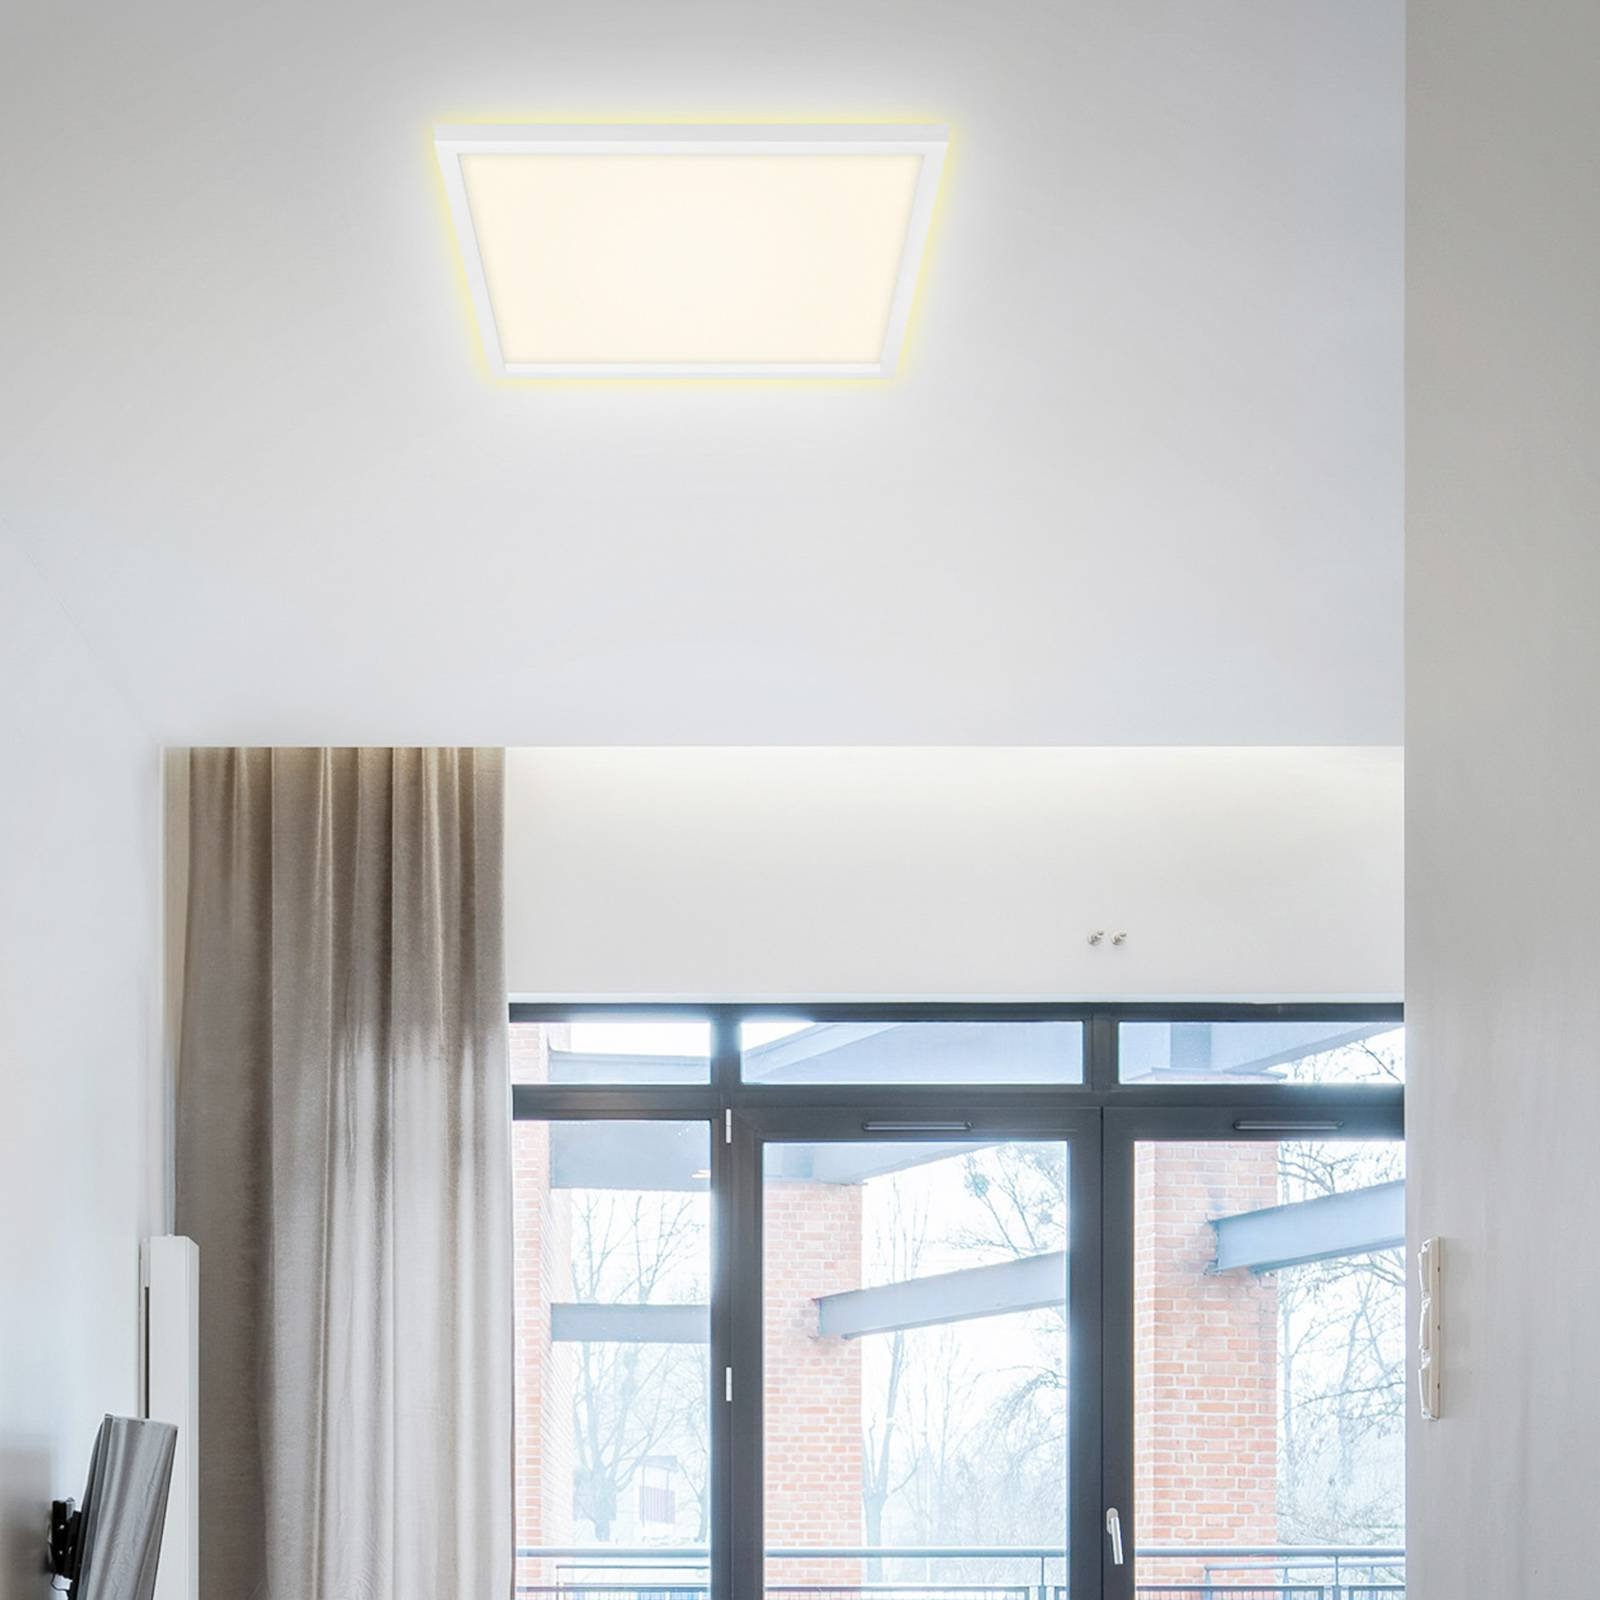 LED-taklampe 7364, 42x42 cm hvit